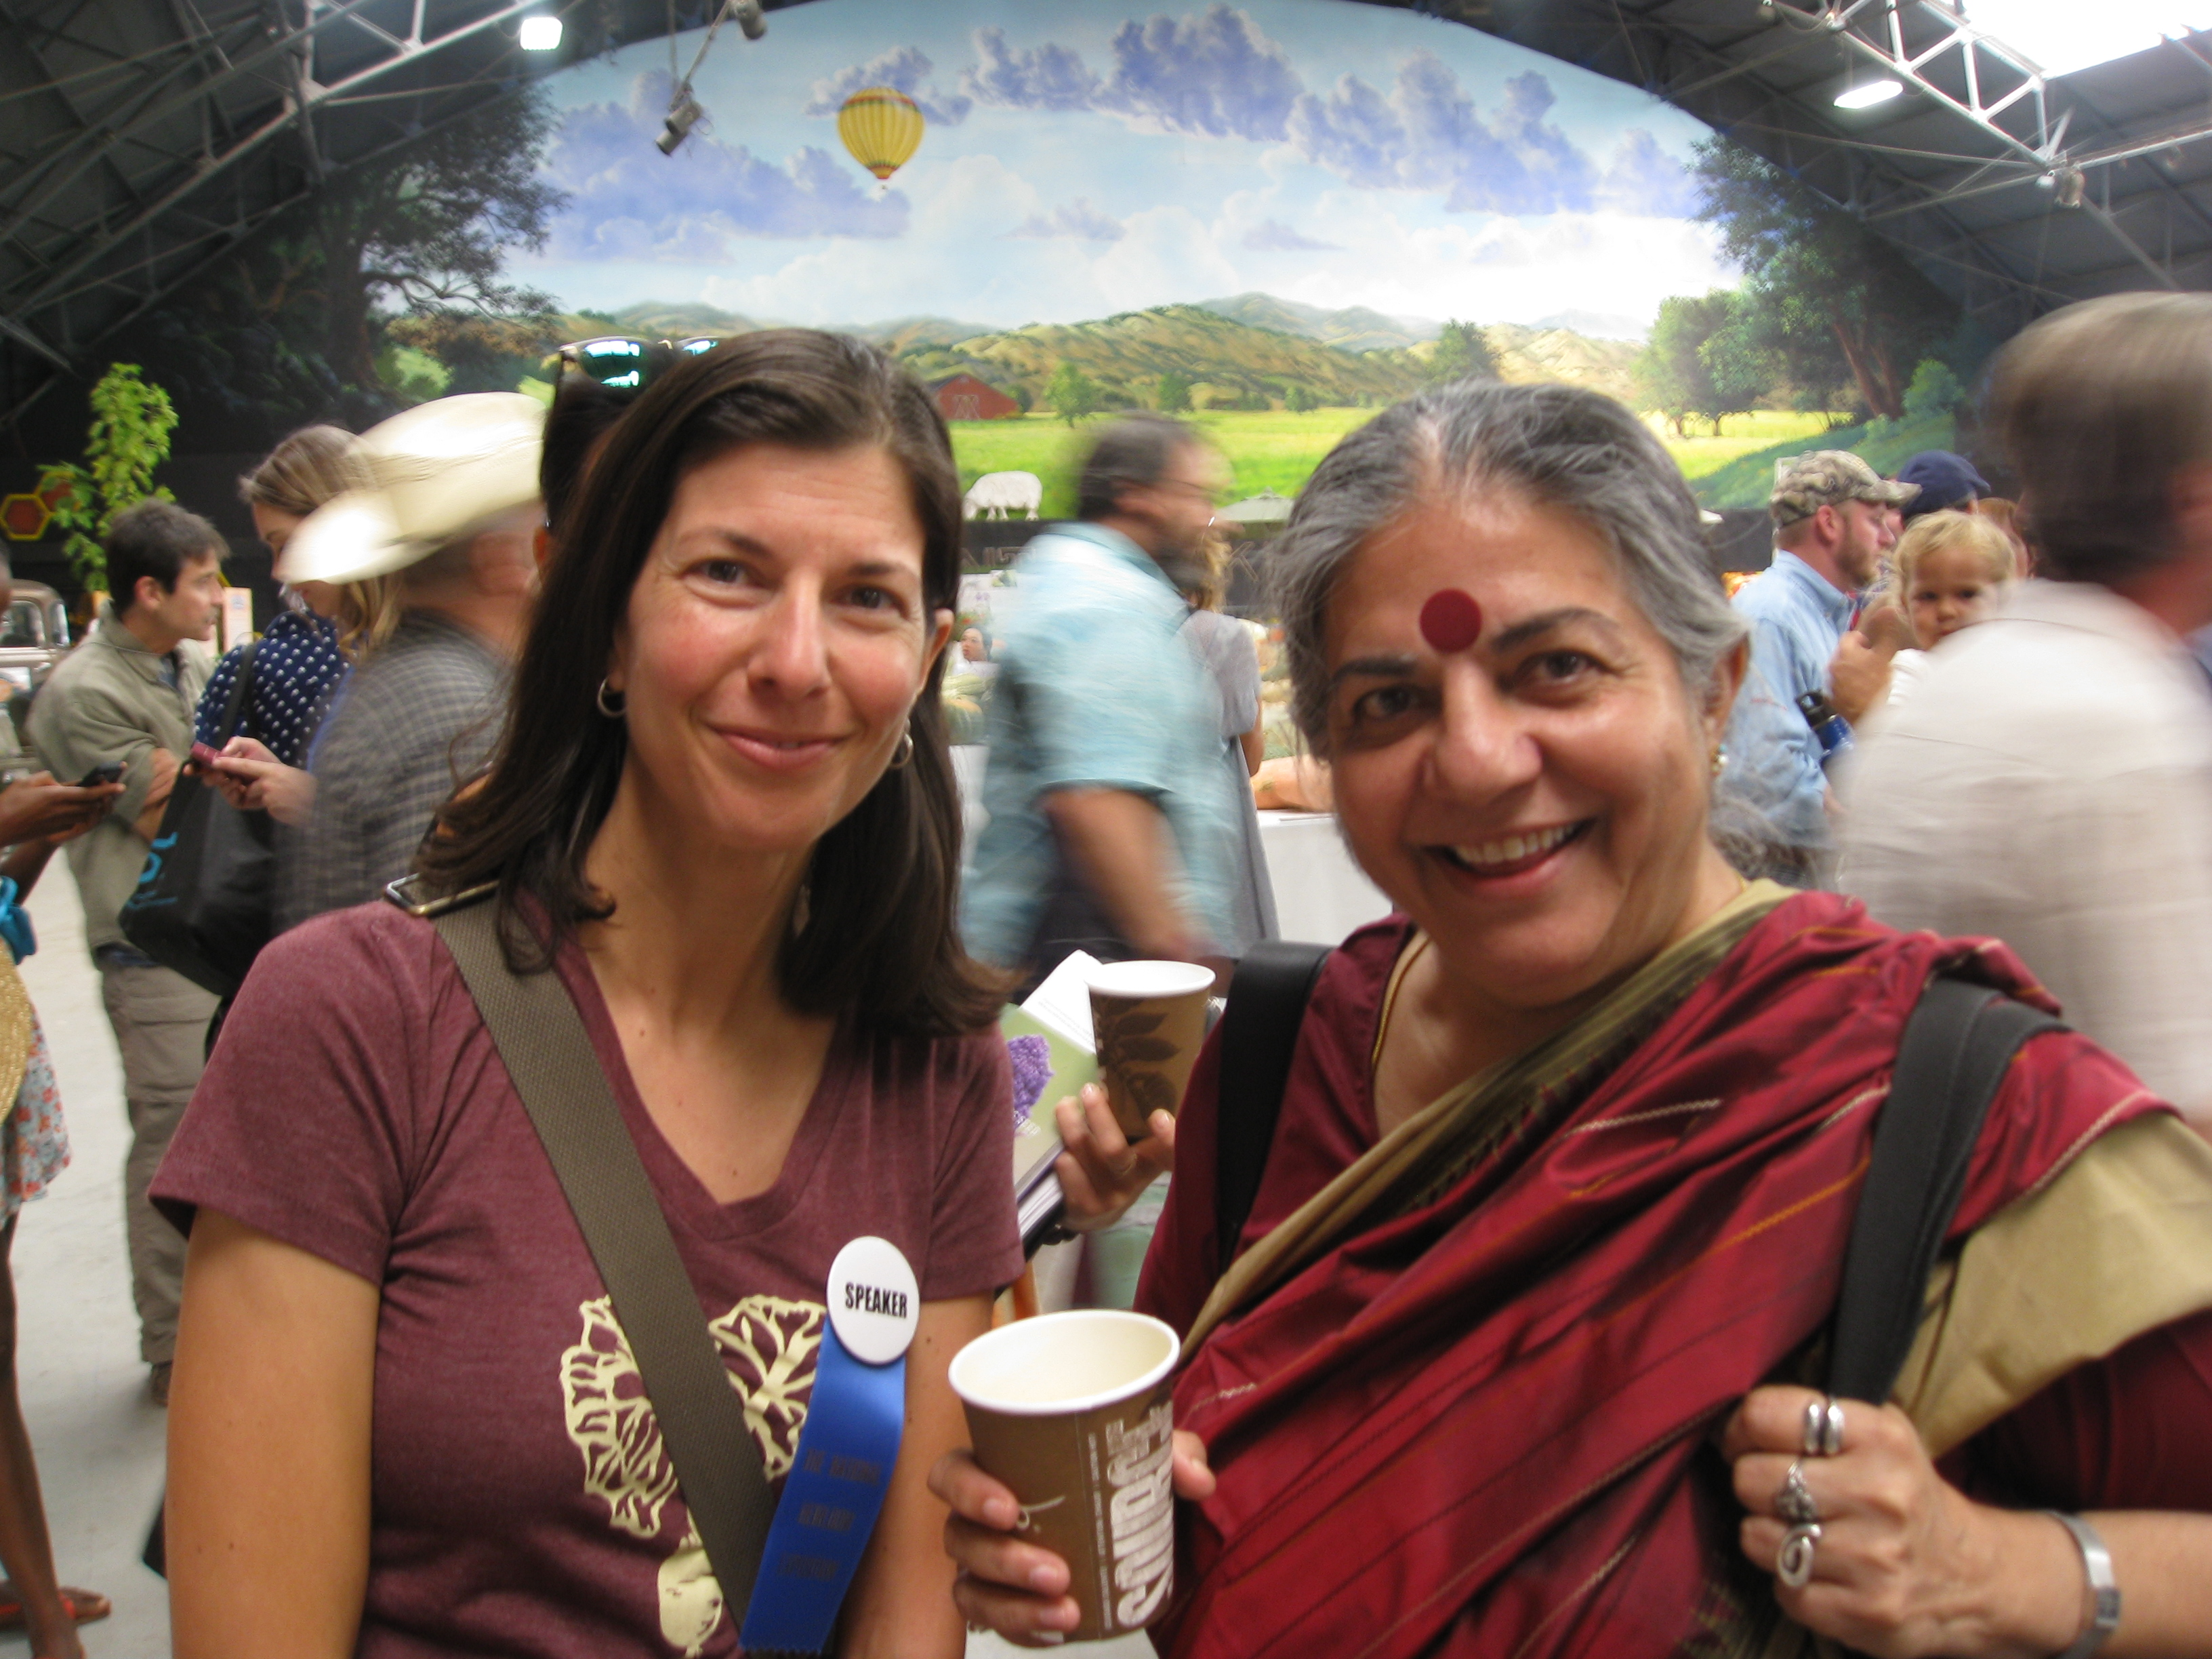 Dr. Vandana Shiva of Navdanya